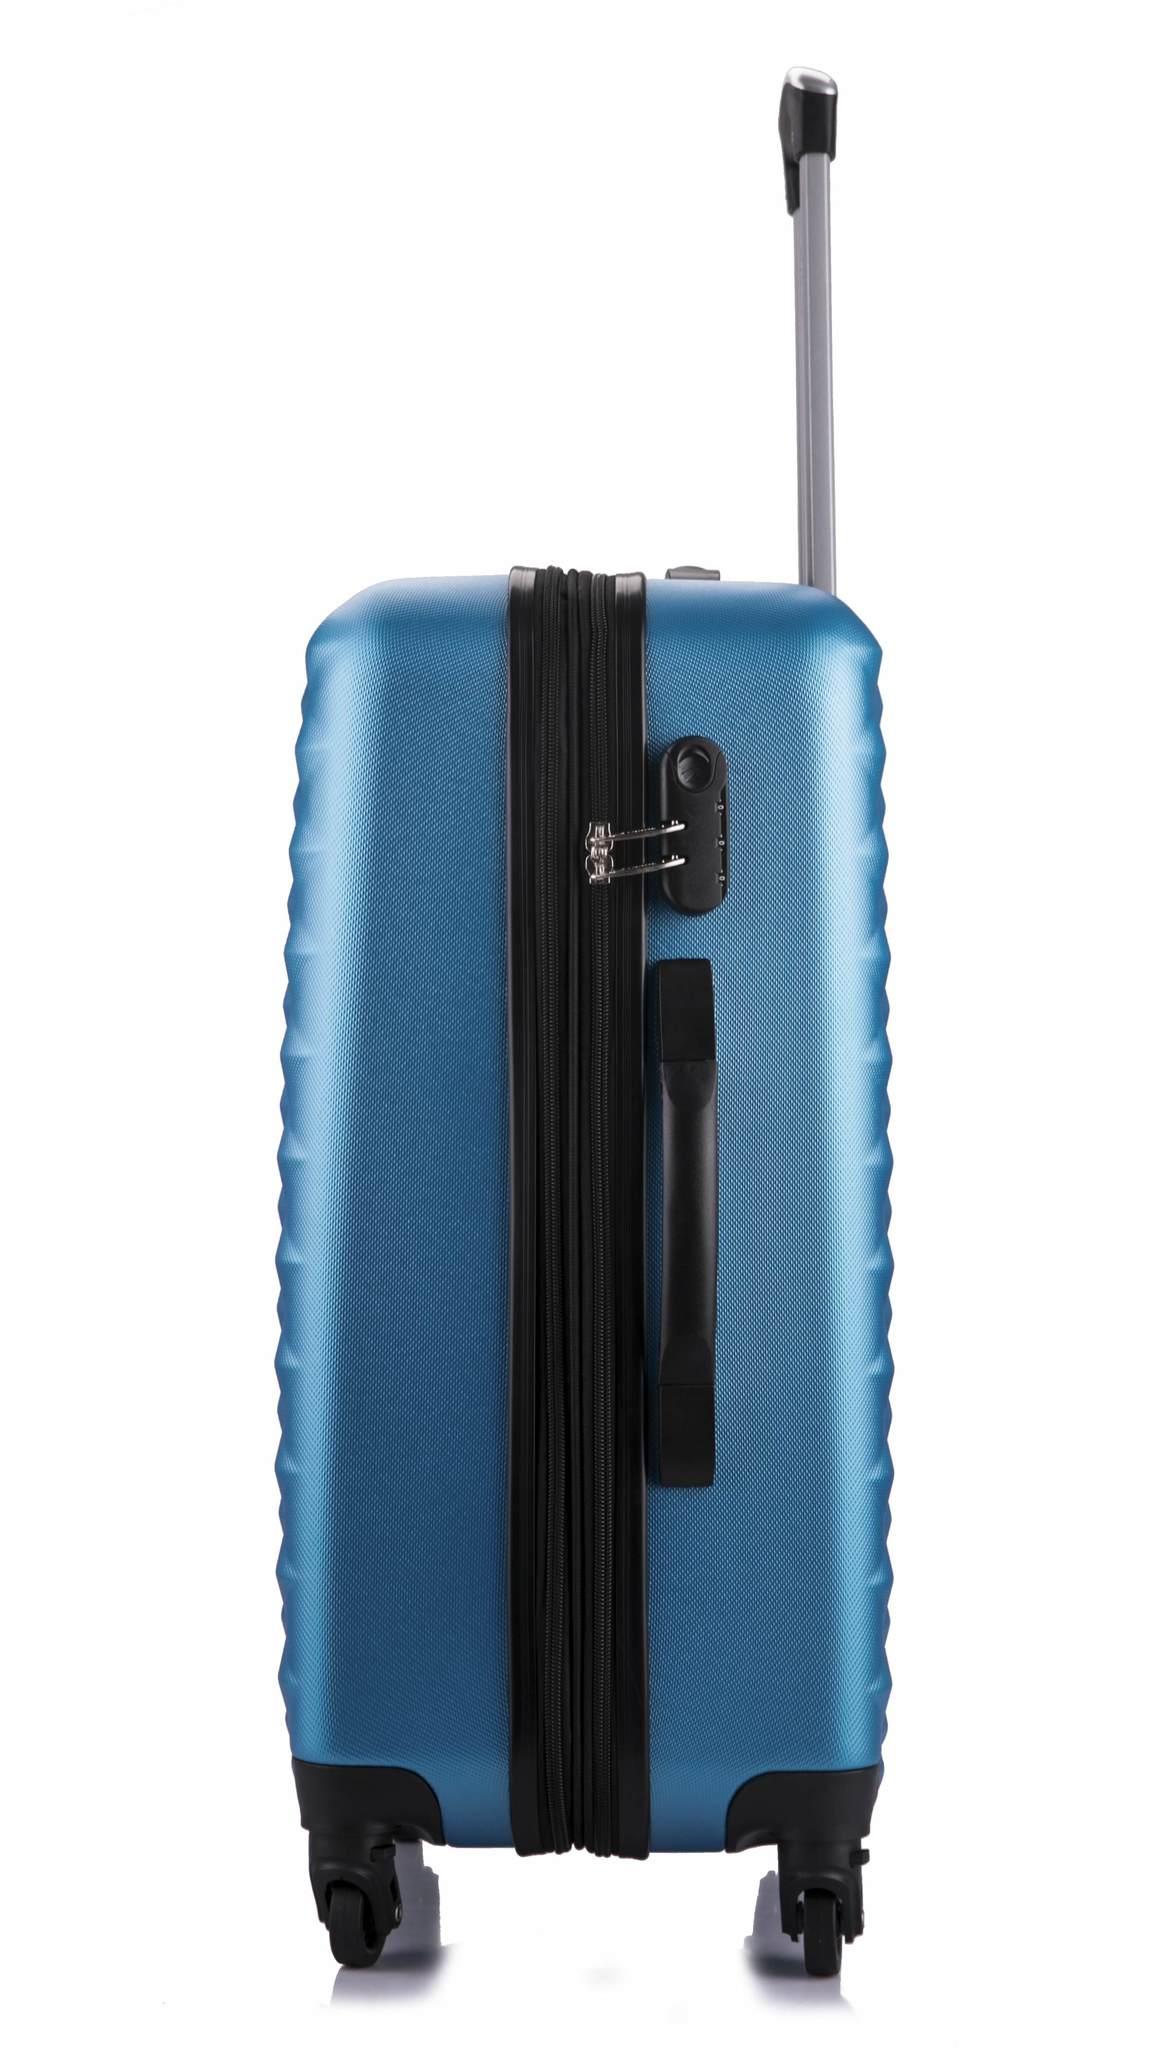 Чемодан с расширением L'case Phatthaya-28 Синий (XL)